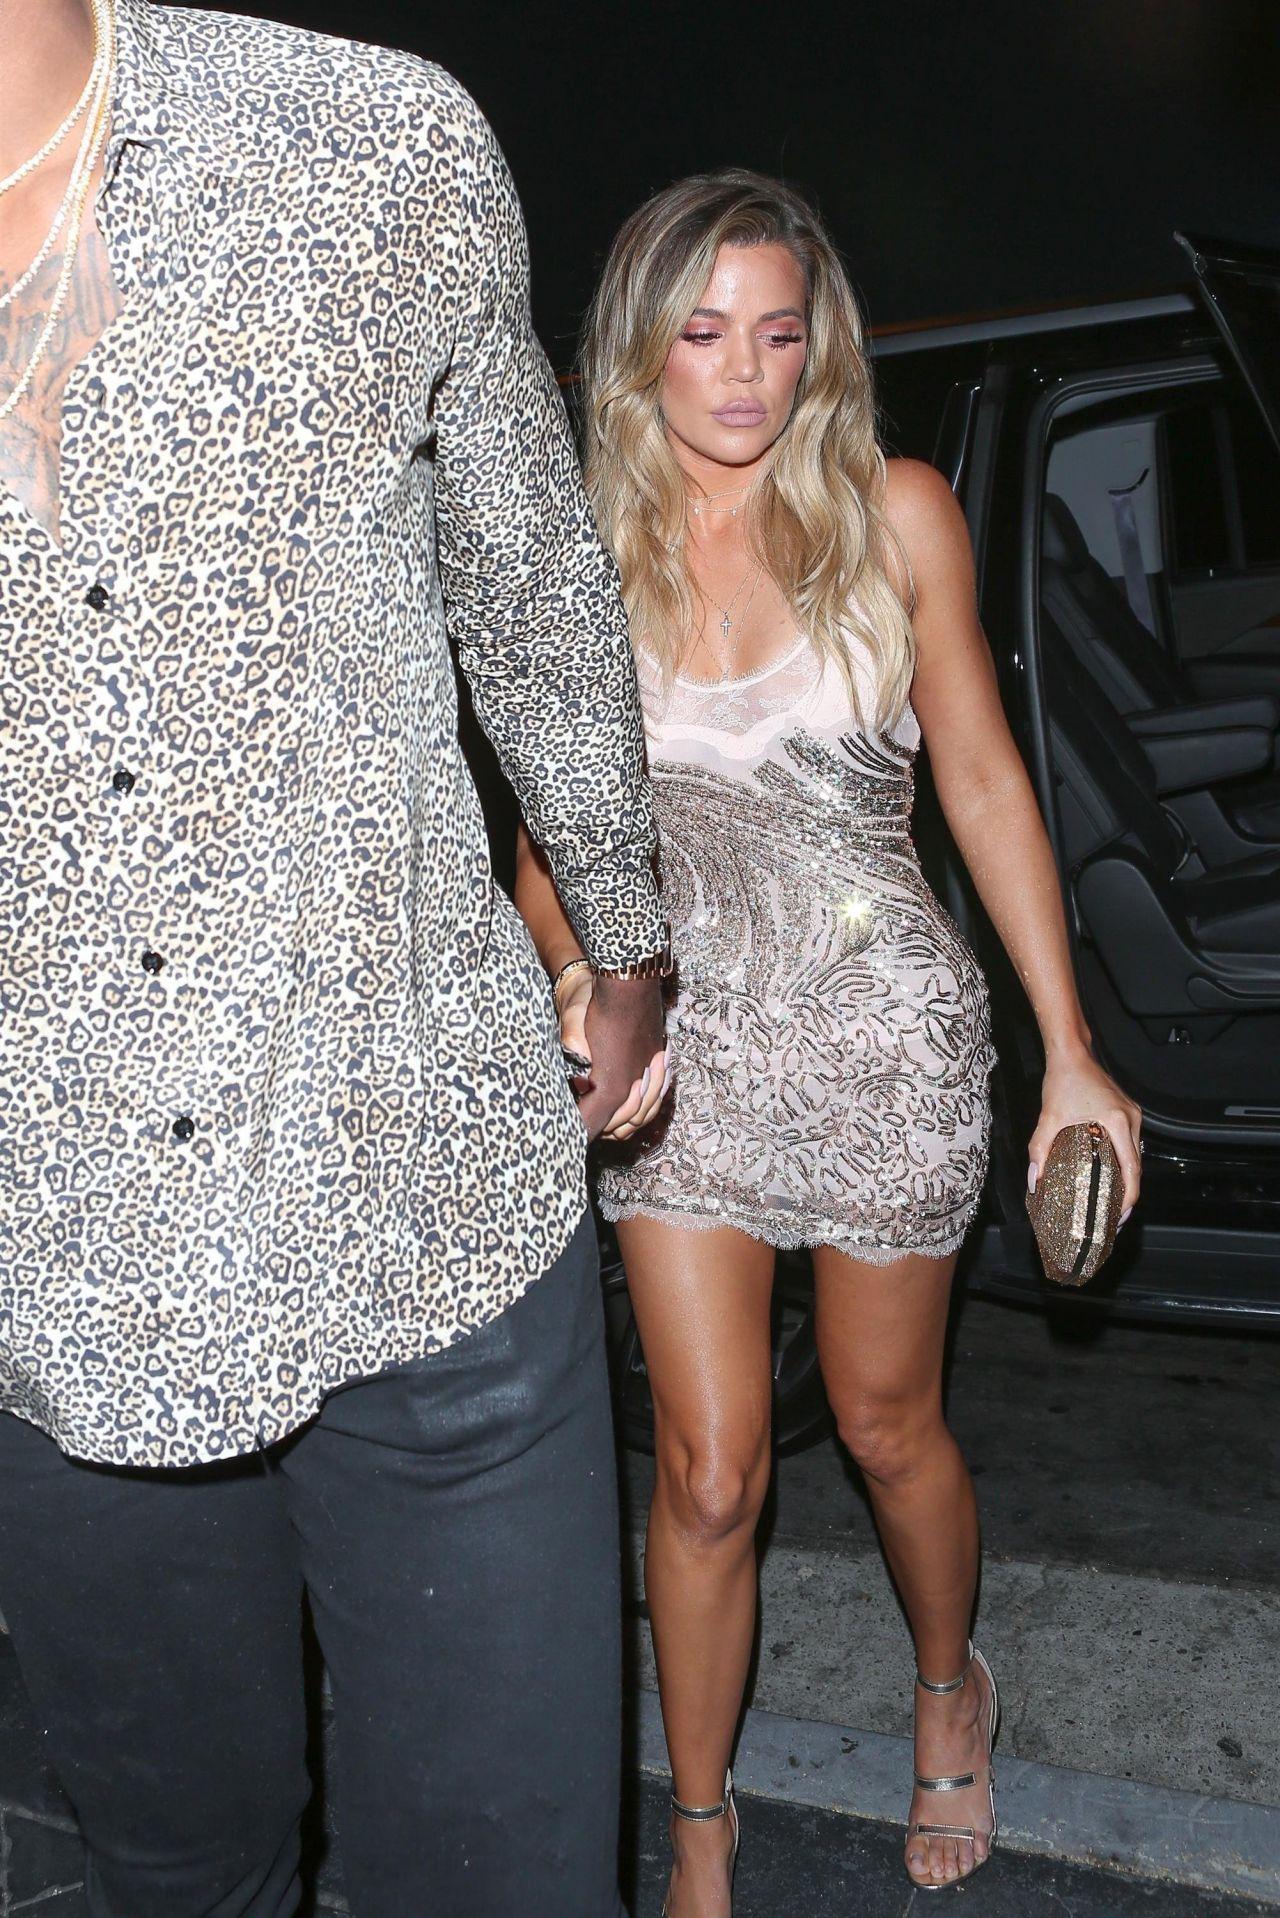 Khloe Kardashian Style Arriving At Her Surprise Birthday